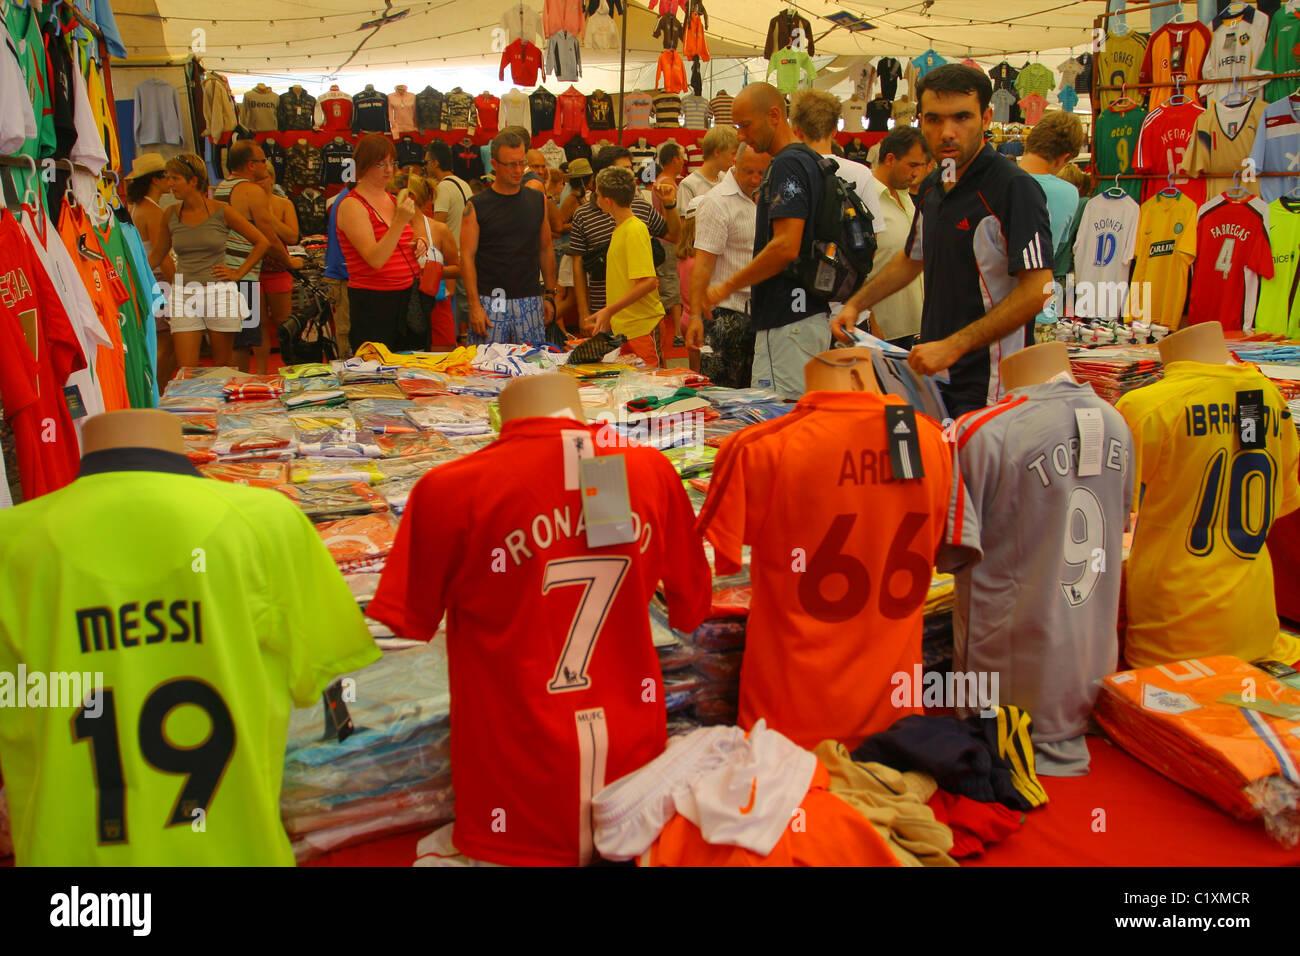 dd8b11911 Fake replica football kit for sale at tourist market in Fethiye. Mugla